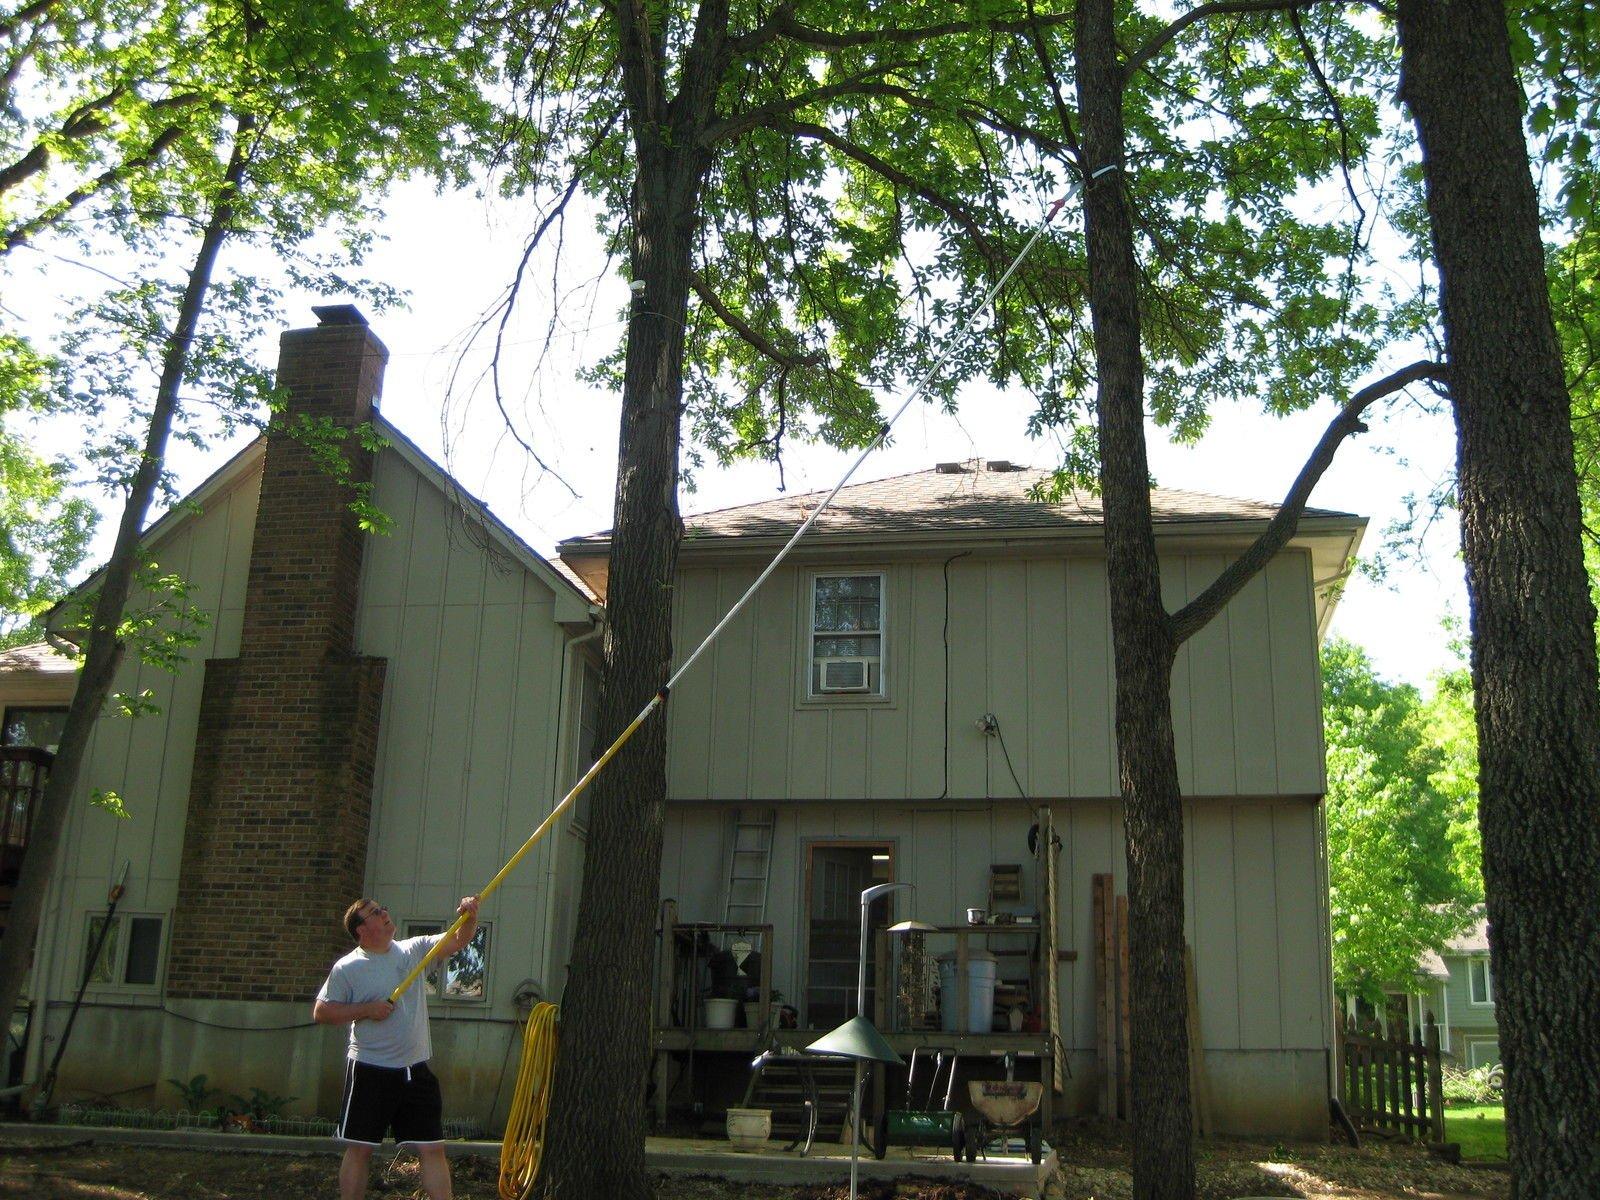 USA Premium Store 27 FOOT POLE SAW Tree Trimmer Saw Tree Pruner Tree Saw